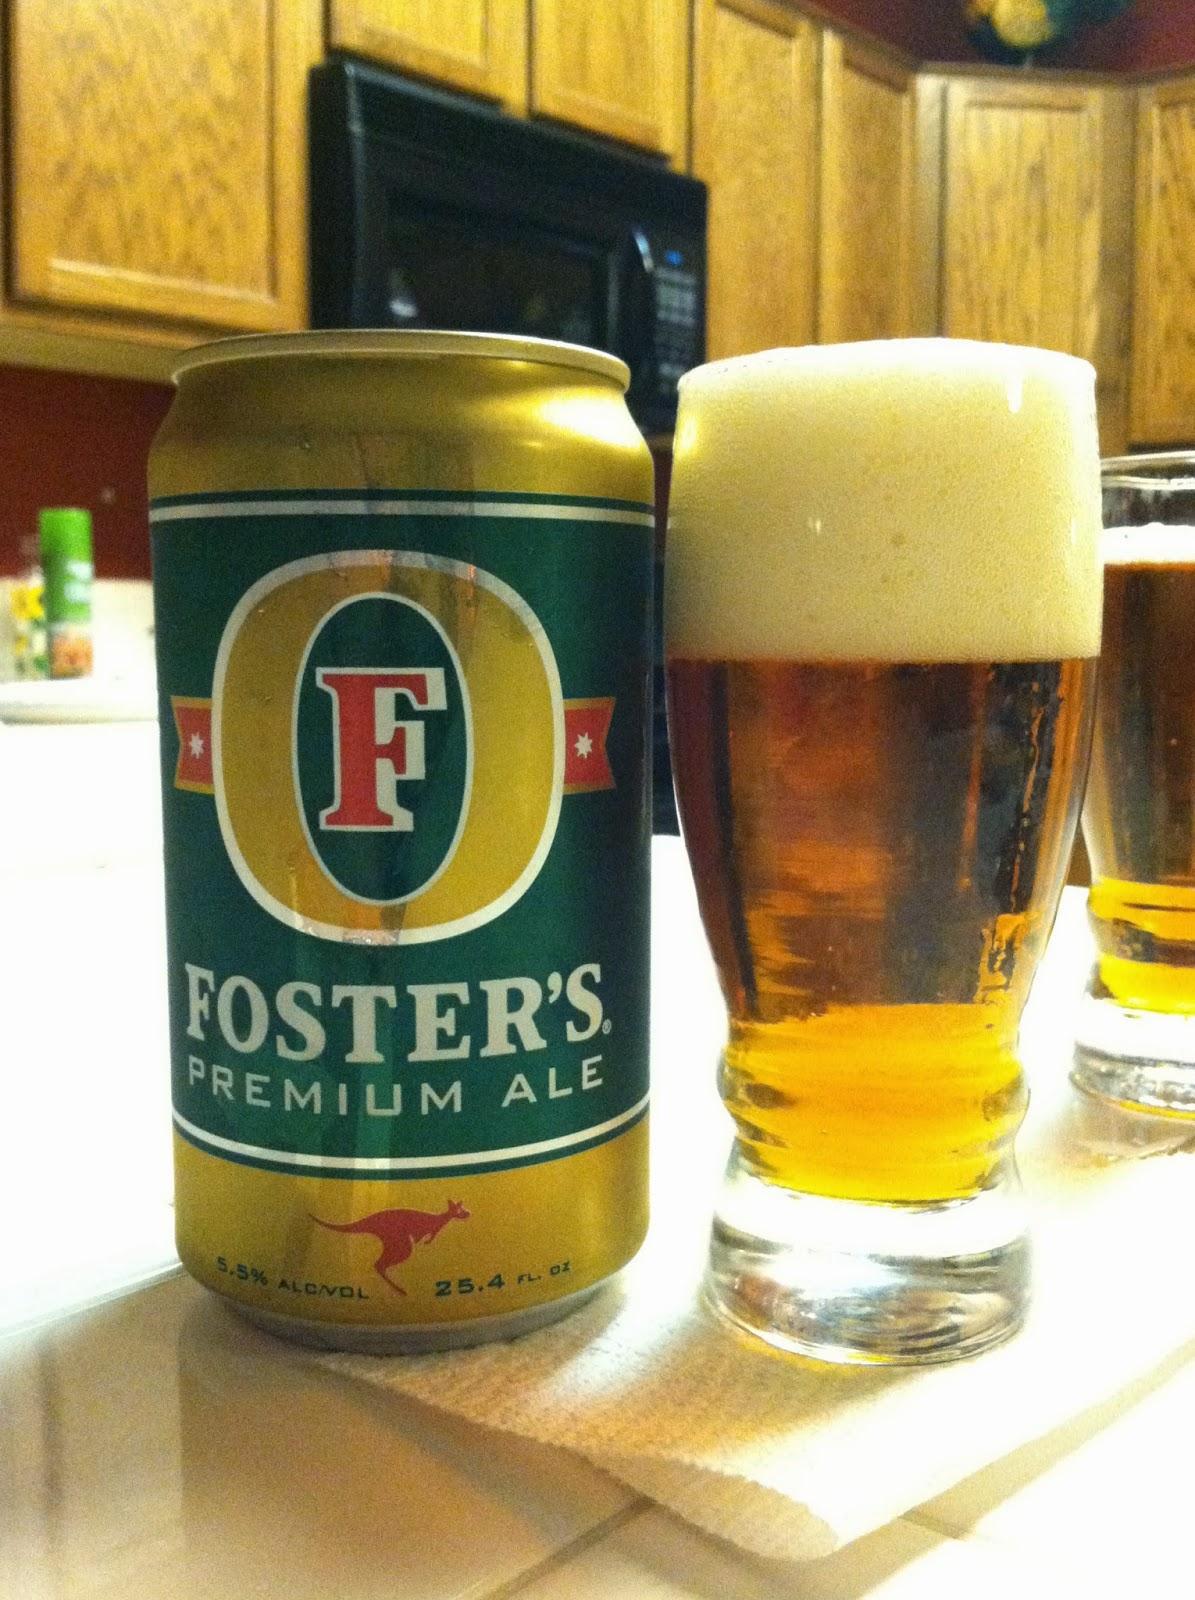 Fosters Premium Ale 1